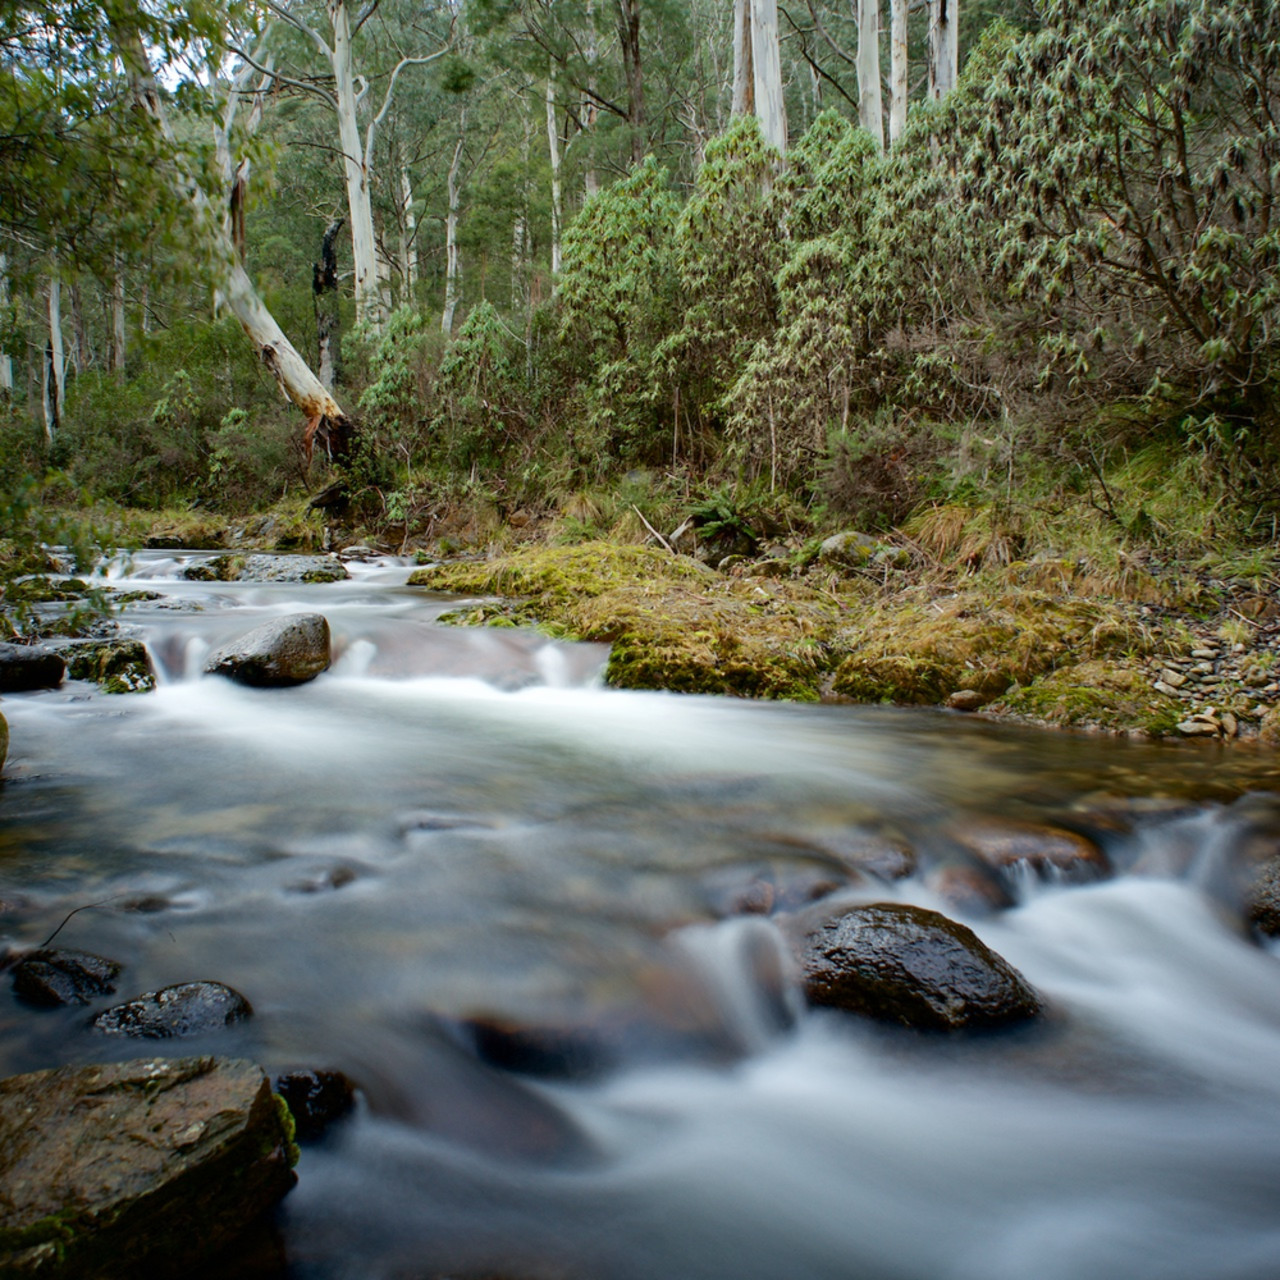 Alpine flow leatherbarrel creek khancoban kosciuszko national park nsw australia dvefnq